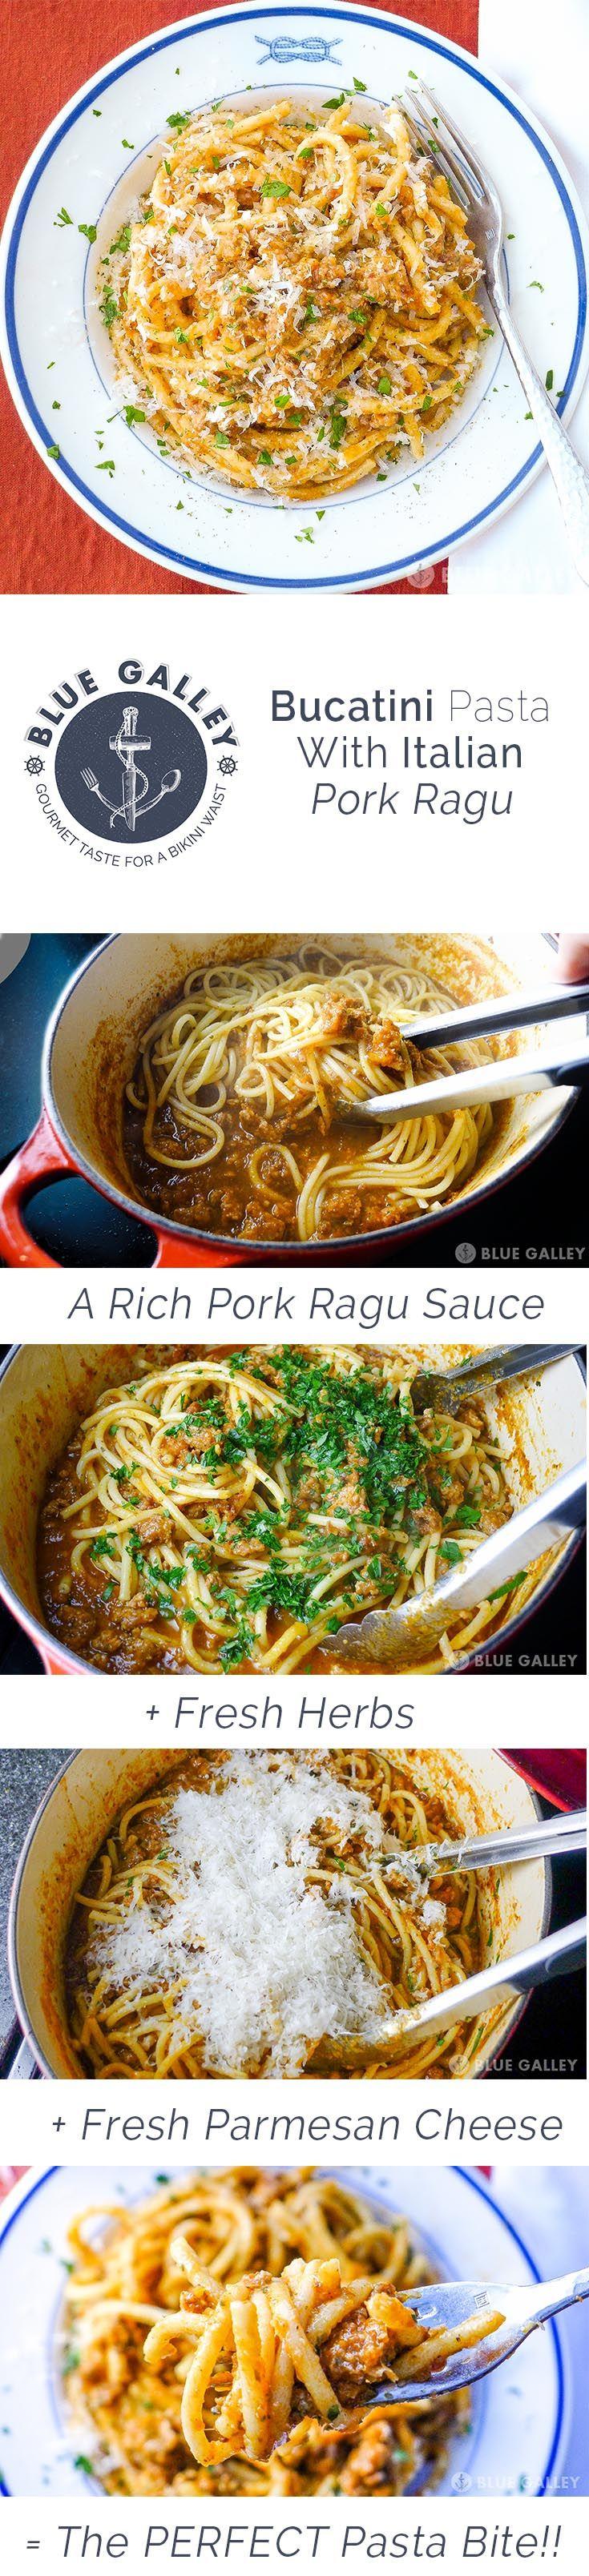 Blue apron bucatini - Blue Galley Bucatini Pasta With Pork Ragu